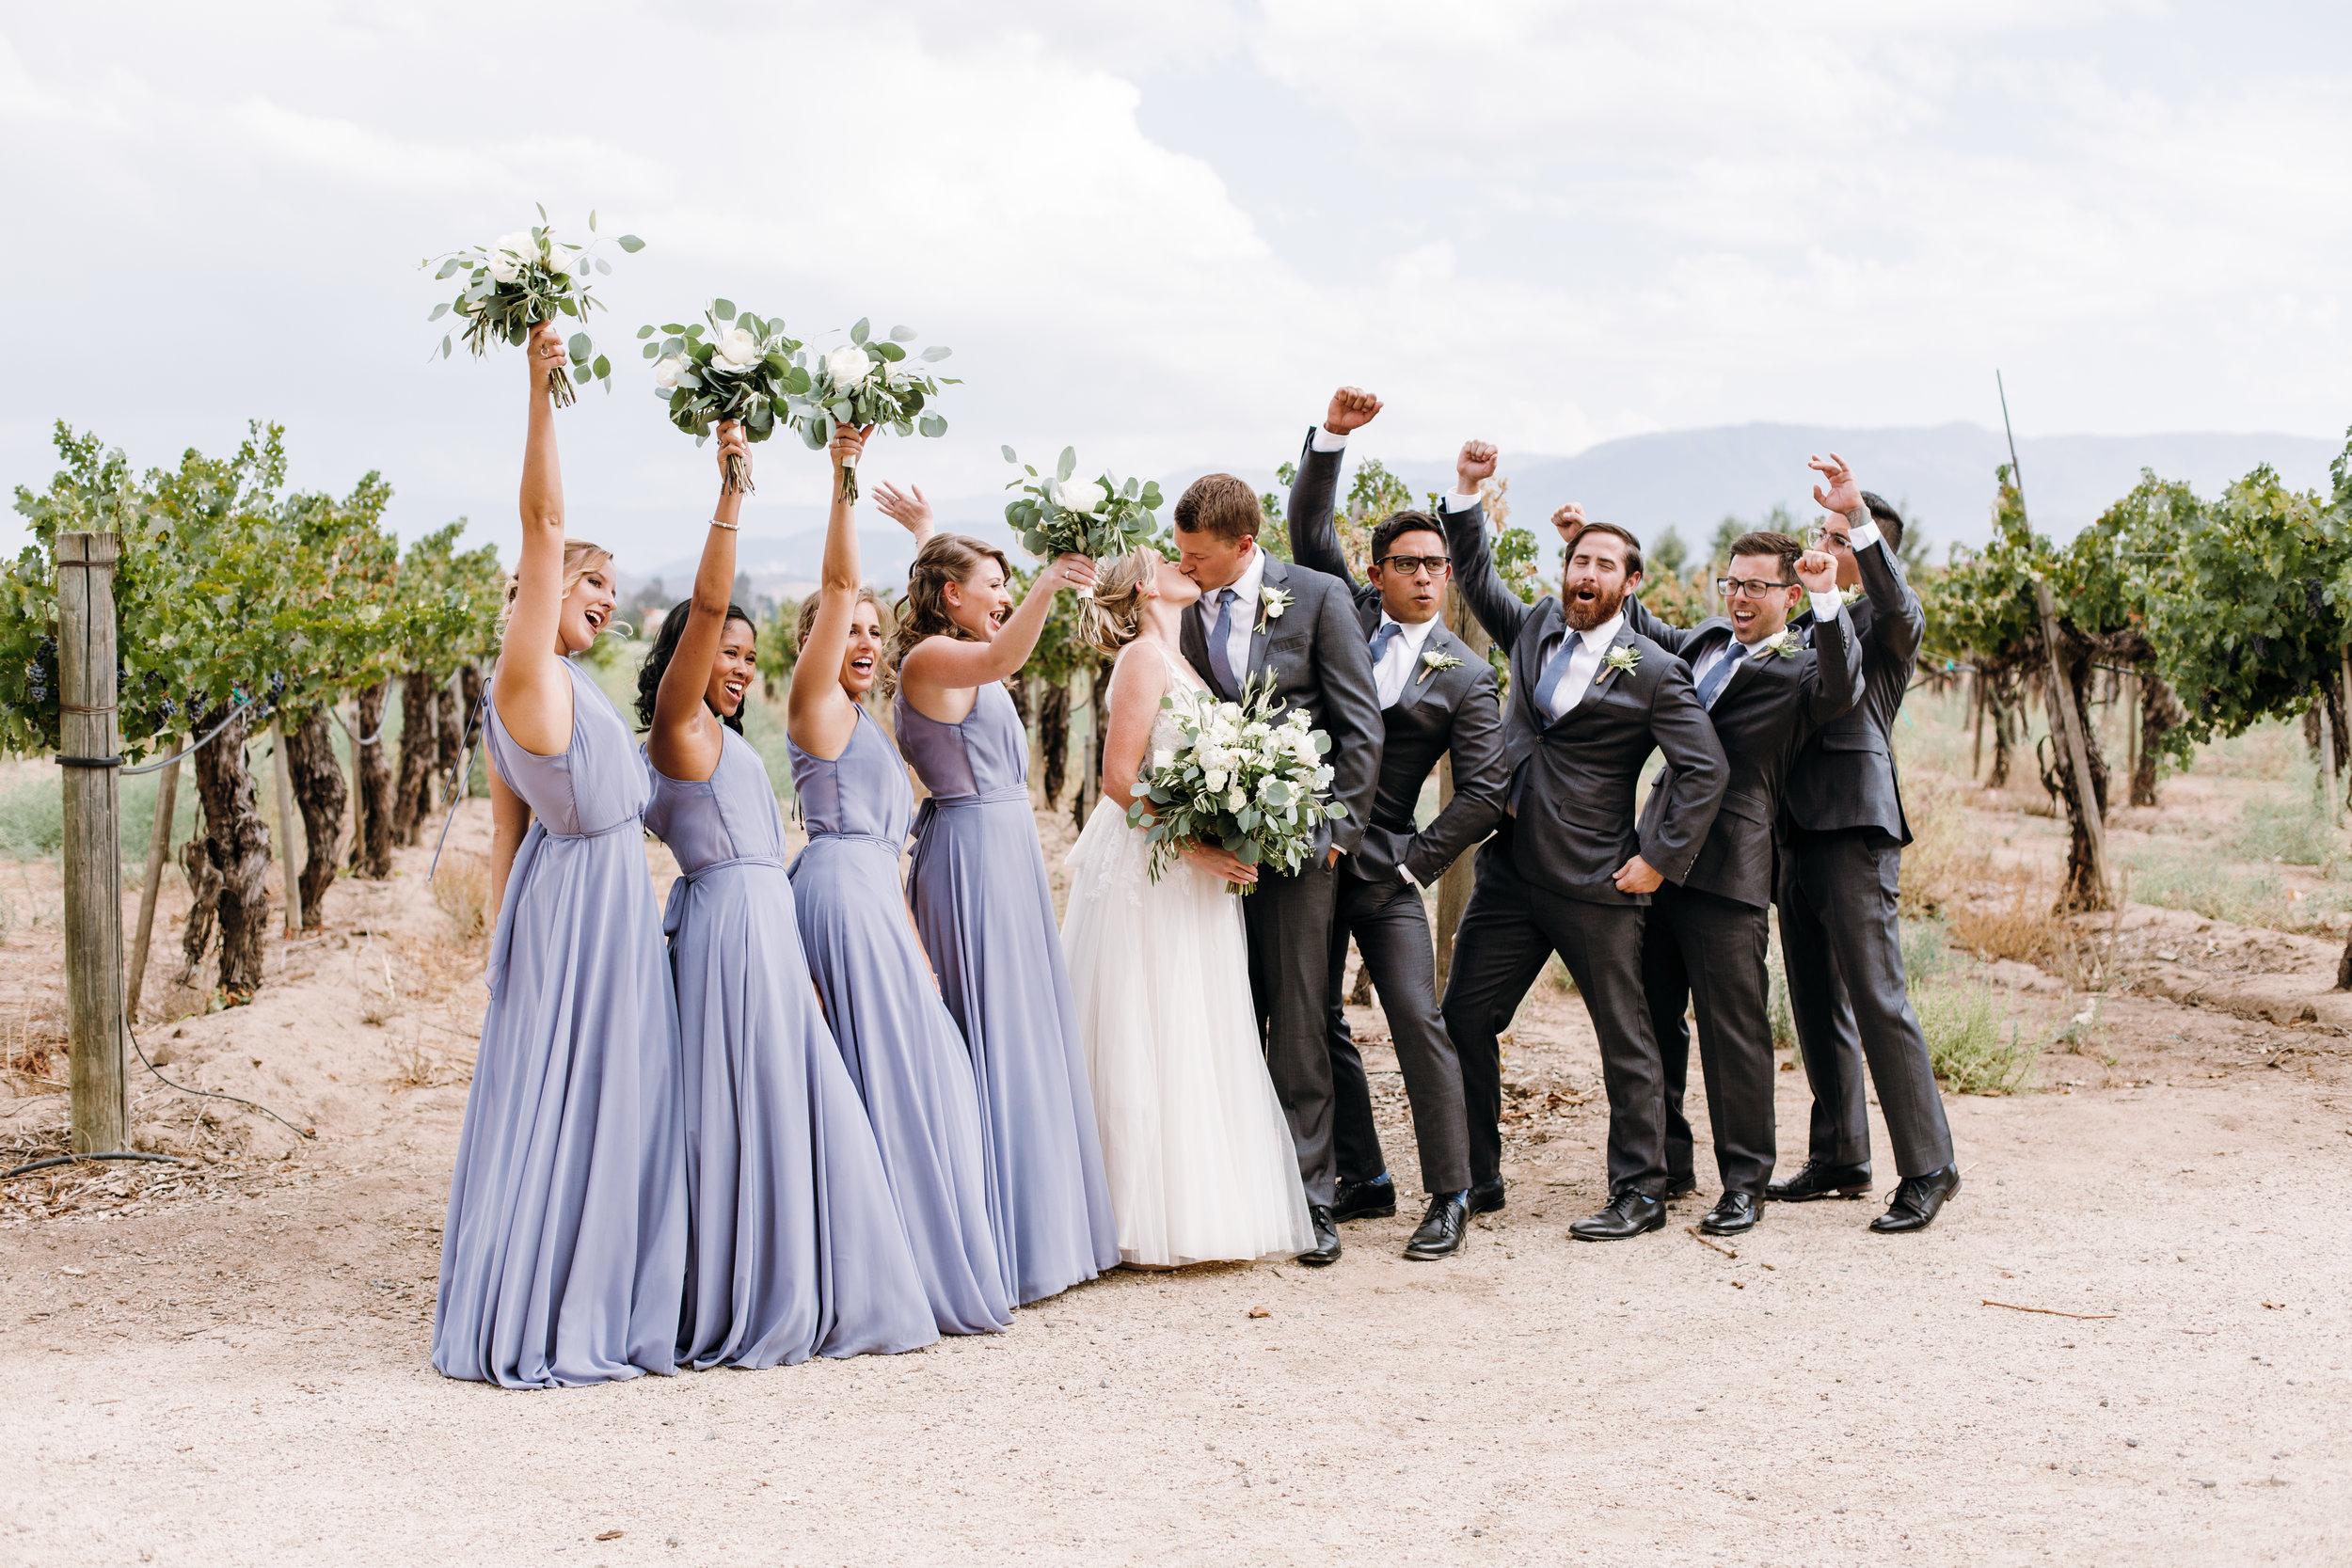 KaraNixonWeddings-Temecula-Wedding-34.jpg